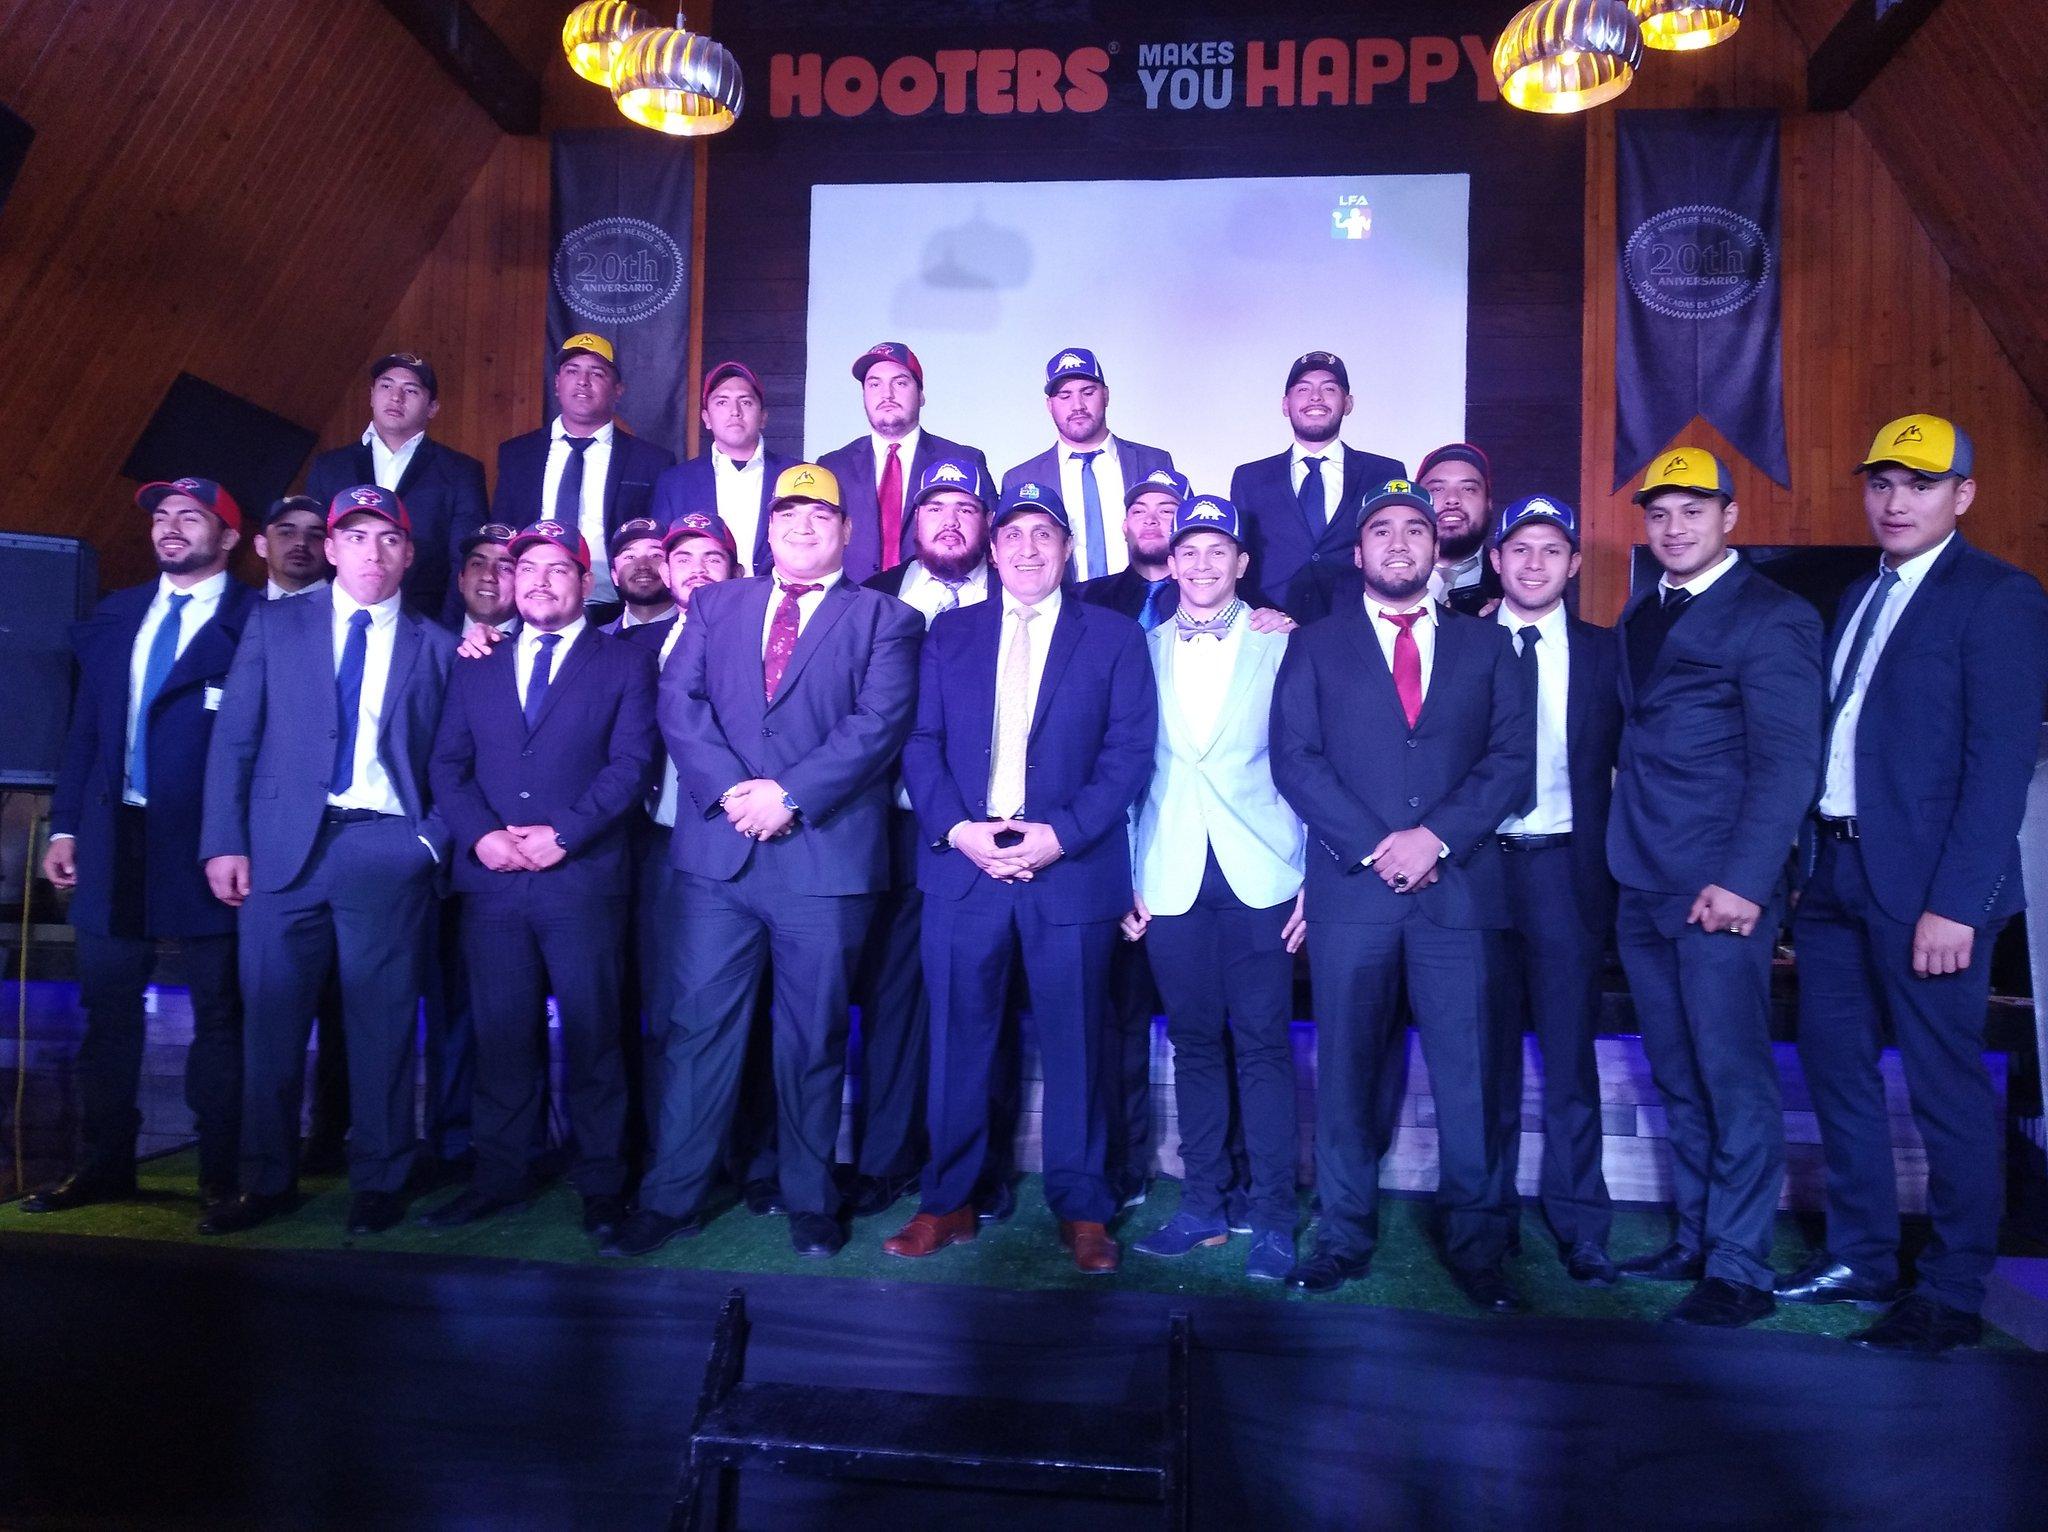 #Entérate | Se refuerzan los rosters de los equipos de la @LFAmex en draft de jugadores https://t.co/zjOW6ddMMC https://t.co/1yF3nhb2AB